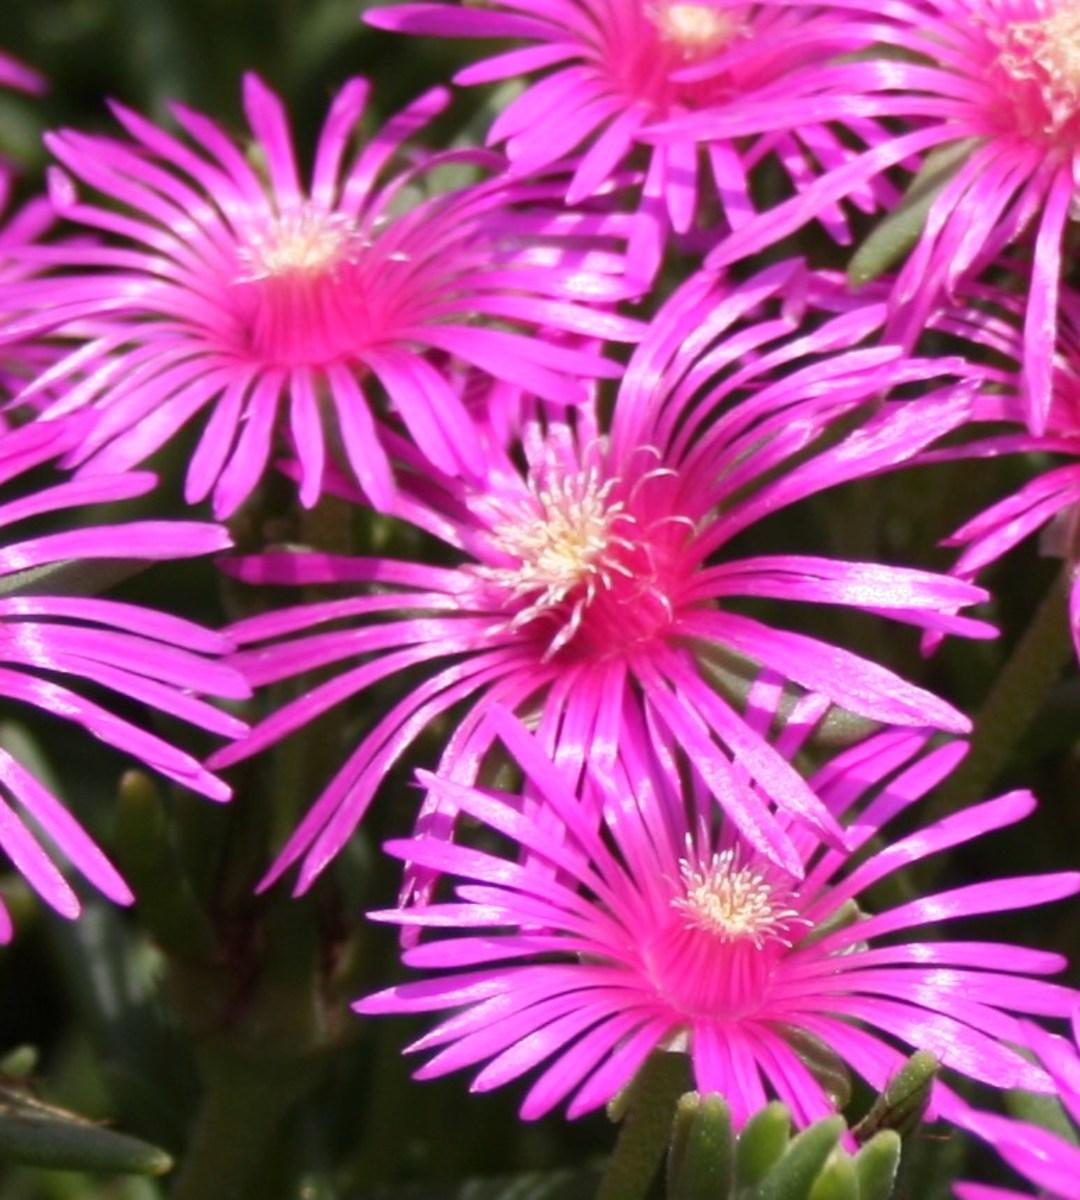 The hardy purple ice plant, Delosperma cooperi, is a pretty hot pink ground cover.